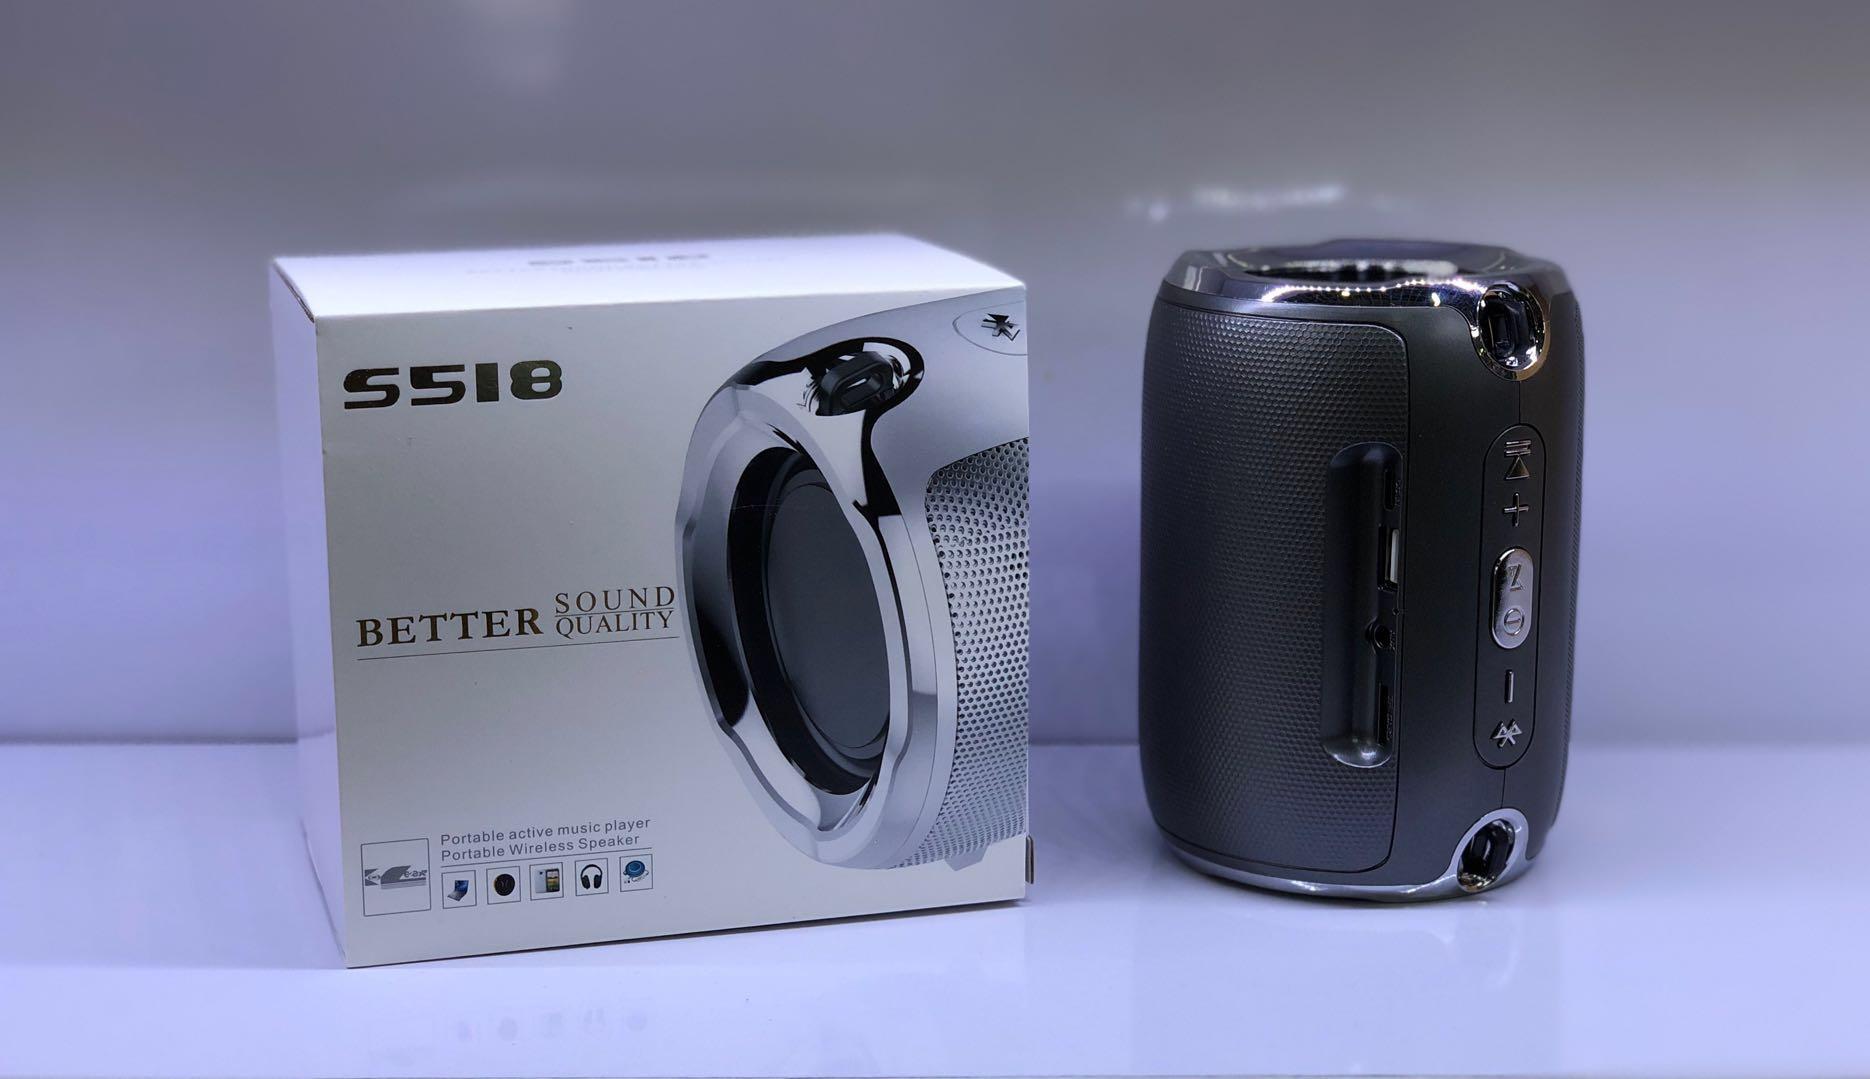 Philippines Bestsellers Kenwood Kfc E1665 Car Audio Speaker Setup Multimedia Bluetooth Subwoofer Jt 909 S518 Portable Wireless Better Sound Quality Black